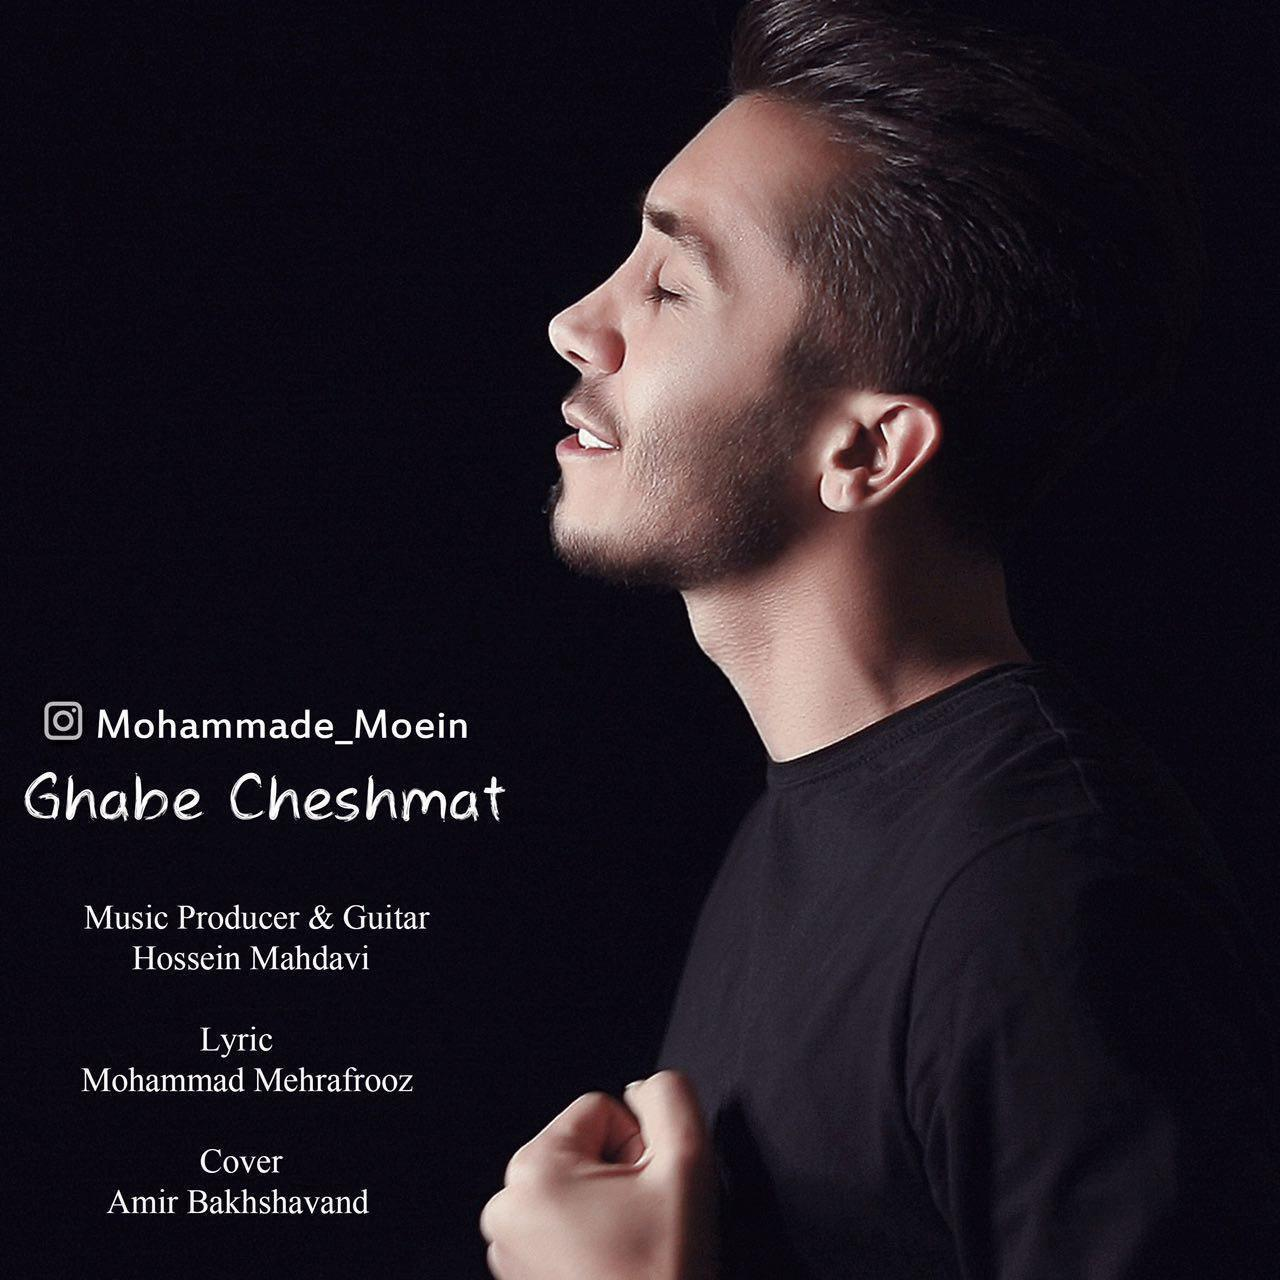 Mohammad Moein – Ghabe Cheshmat